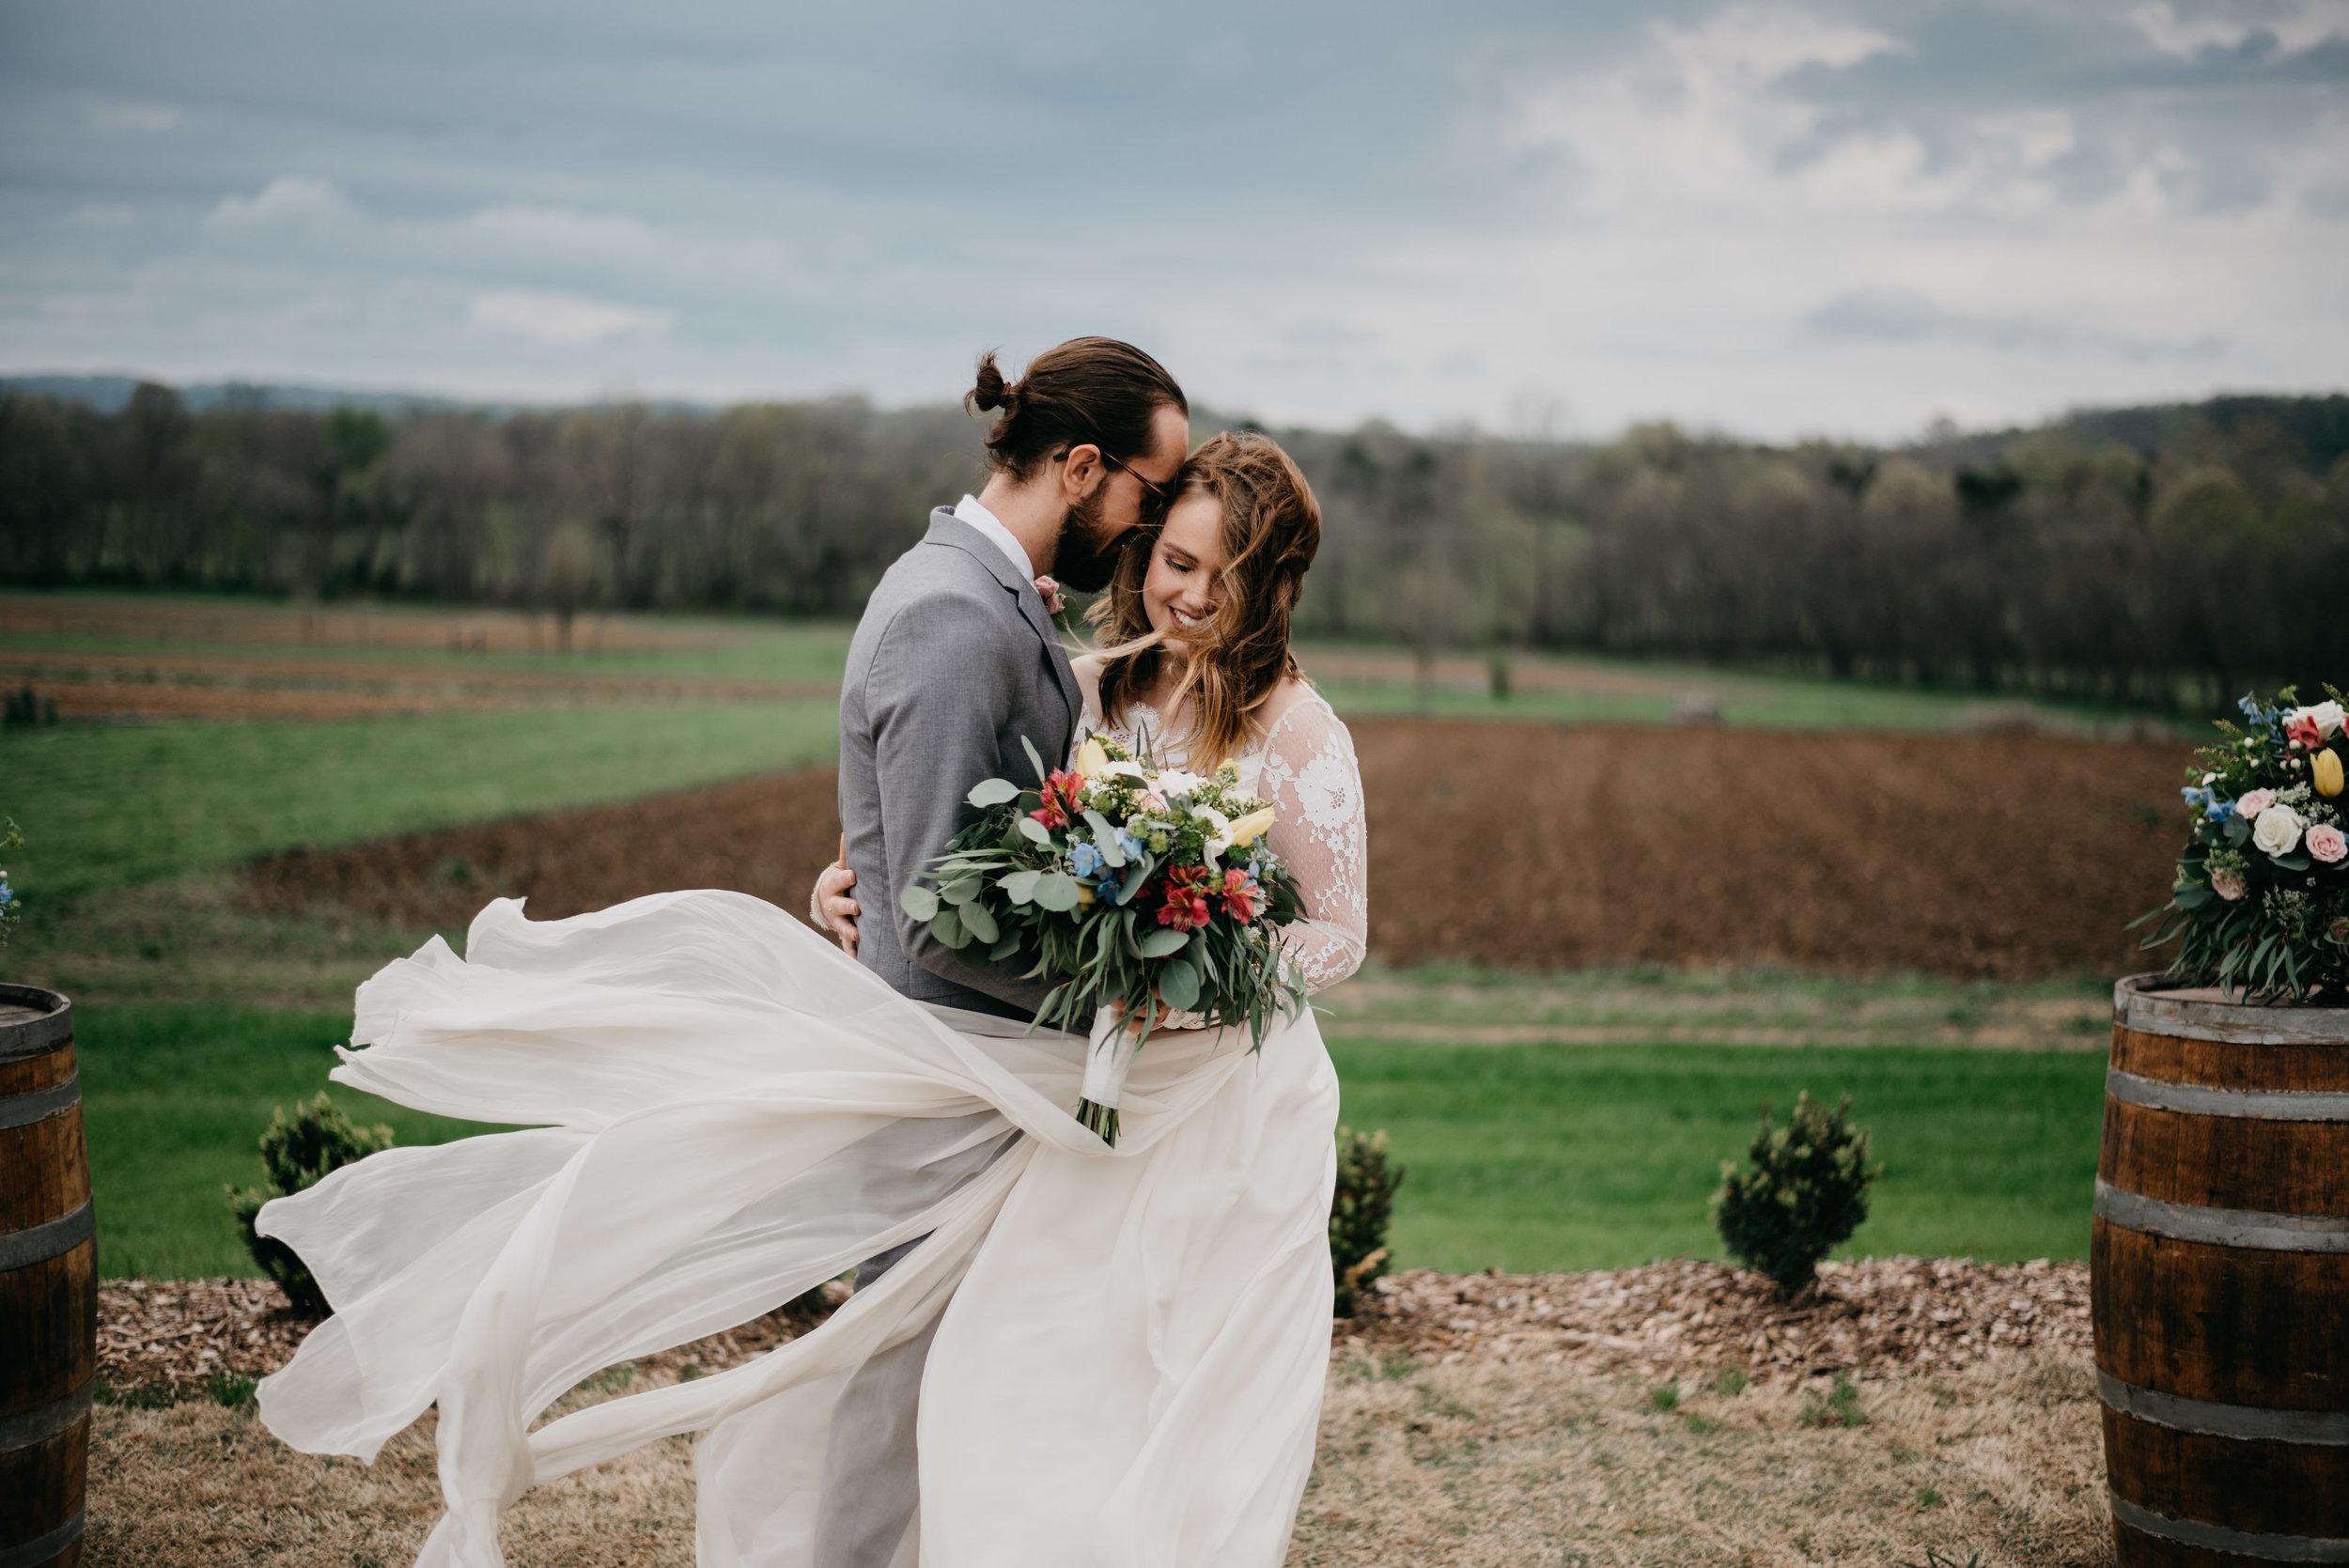 Allenbrooke-Farms-Nashville-Wedding-Photographers 4.jpg